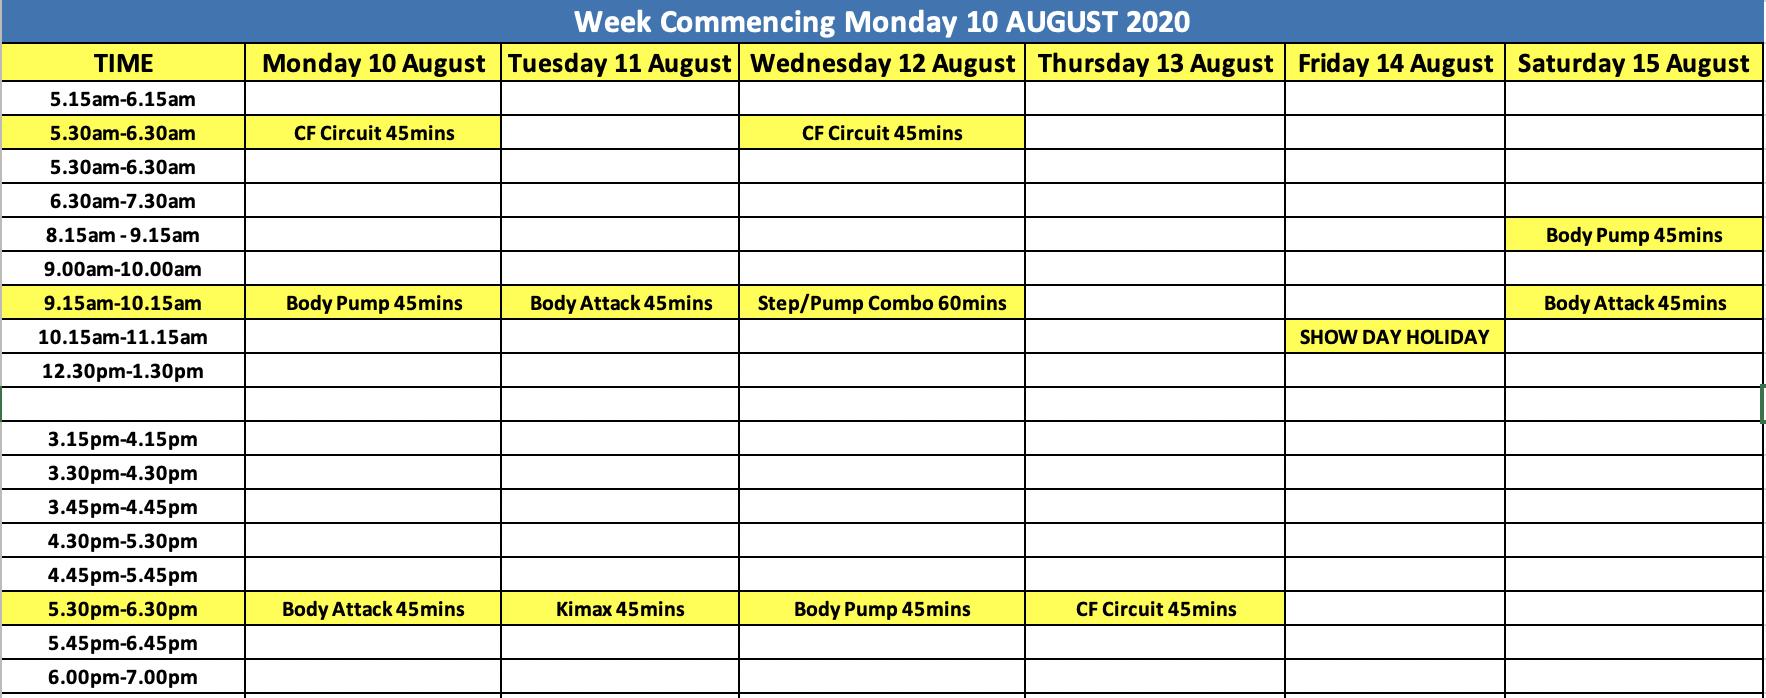 City Fitness Mackay Week of Aug 10 Schedule